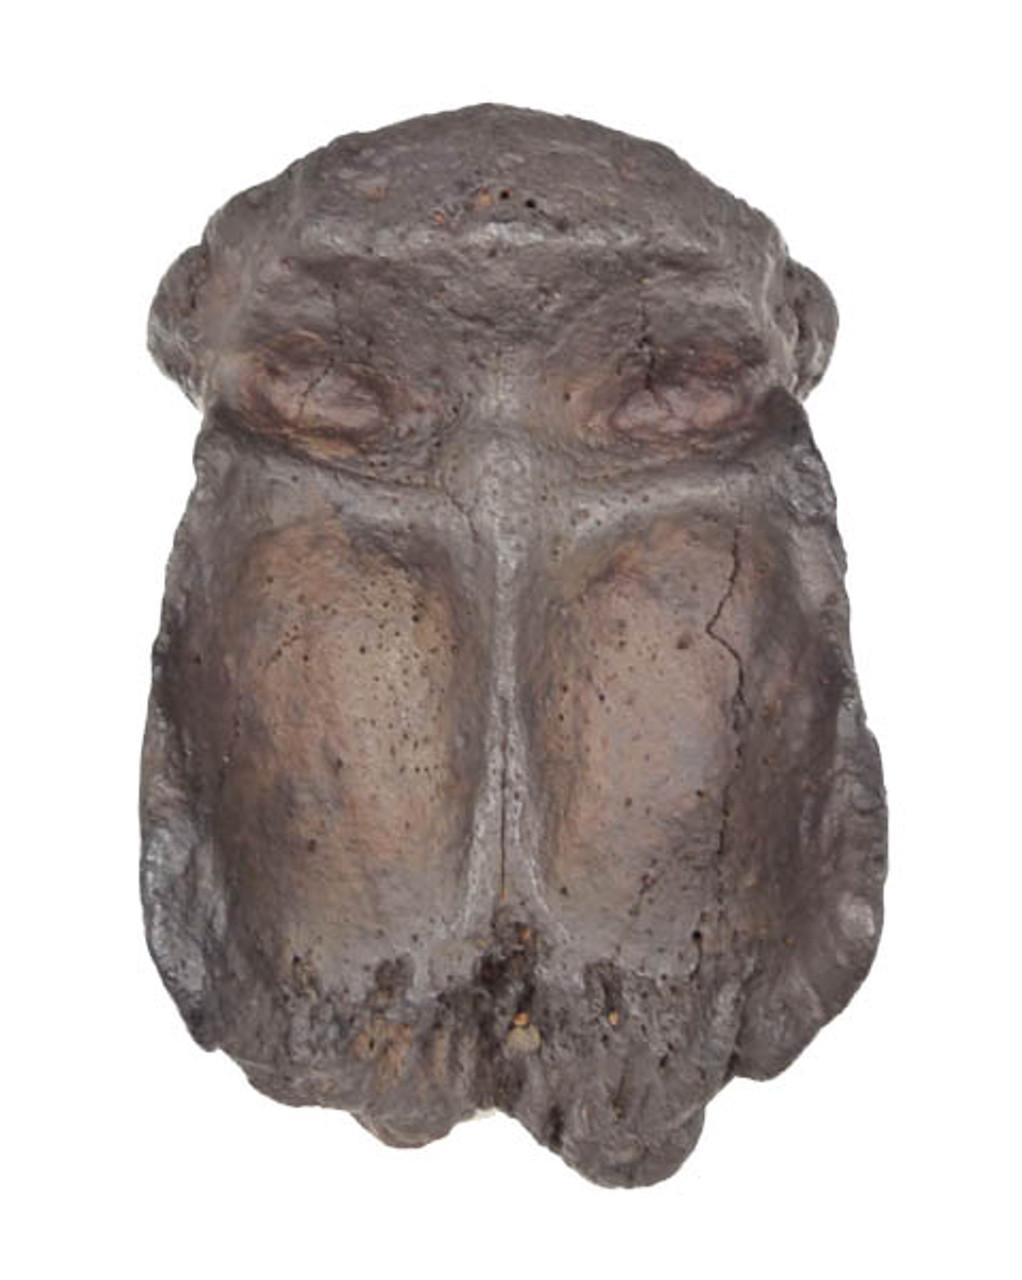 ULTRA RARE INTACT CRANIUM OF THE EARLIEST KNOWN PROTOSIRENIAN SEA COW FROM THE EOCENE *MV31-001